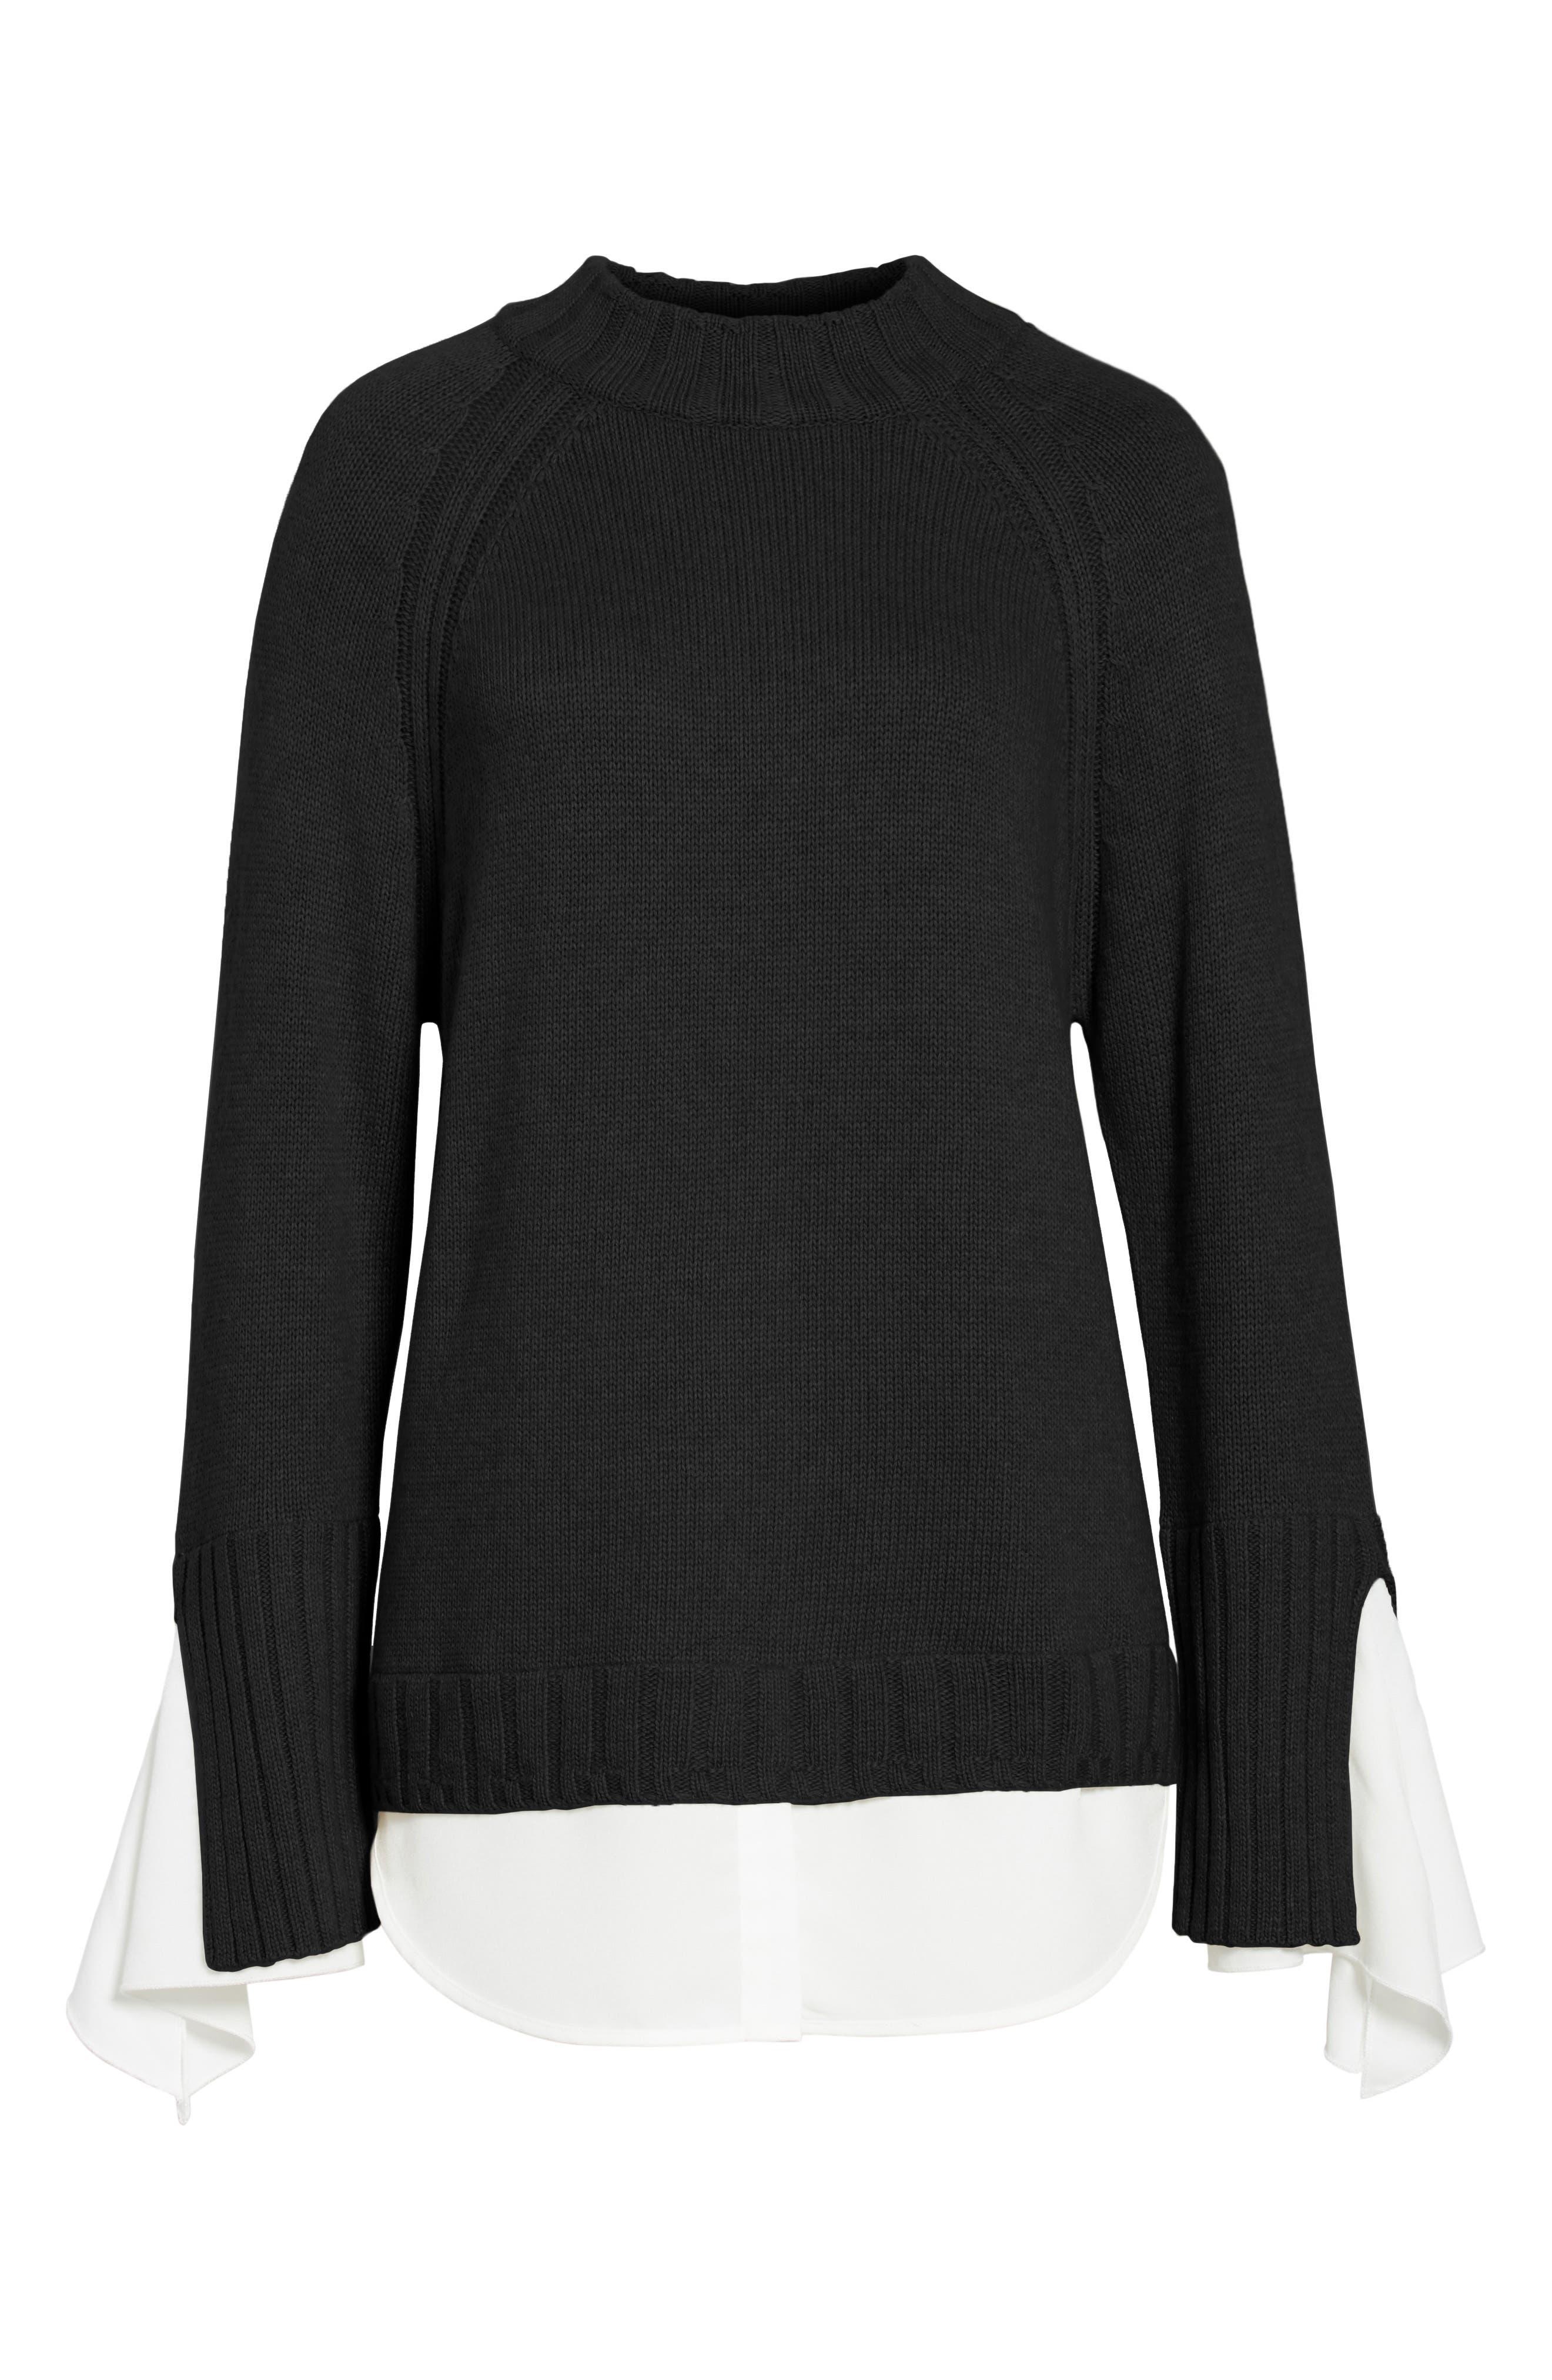 Remi Layered Pullover,                             Alternate thumbnail 6, color,                             Black/ White